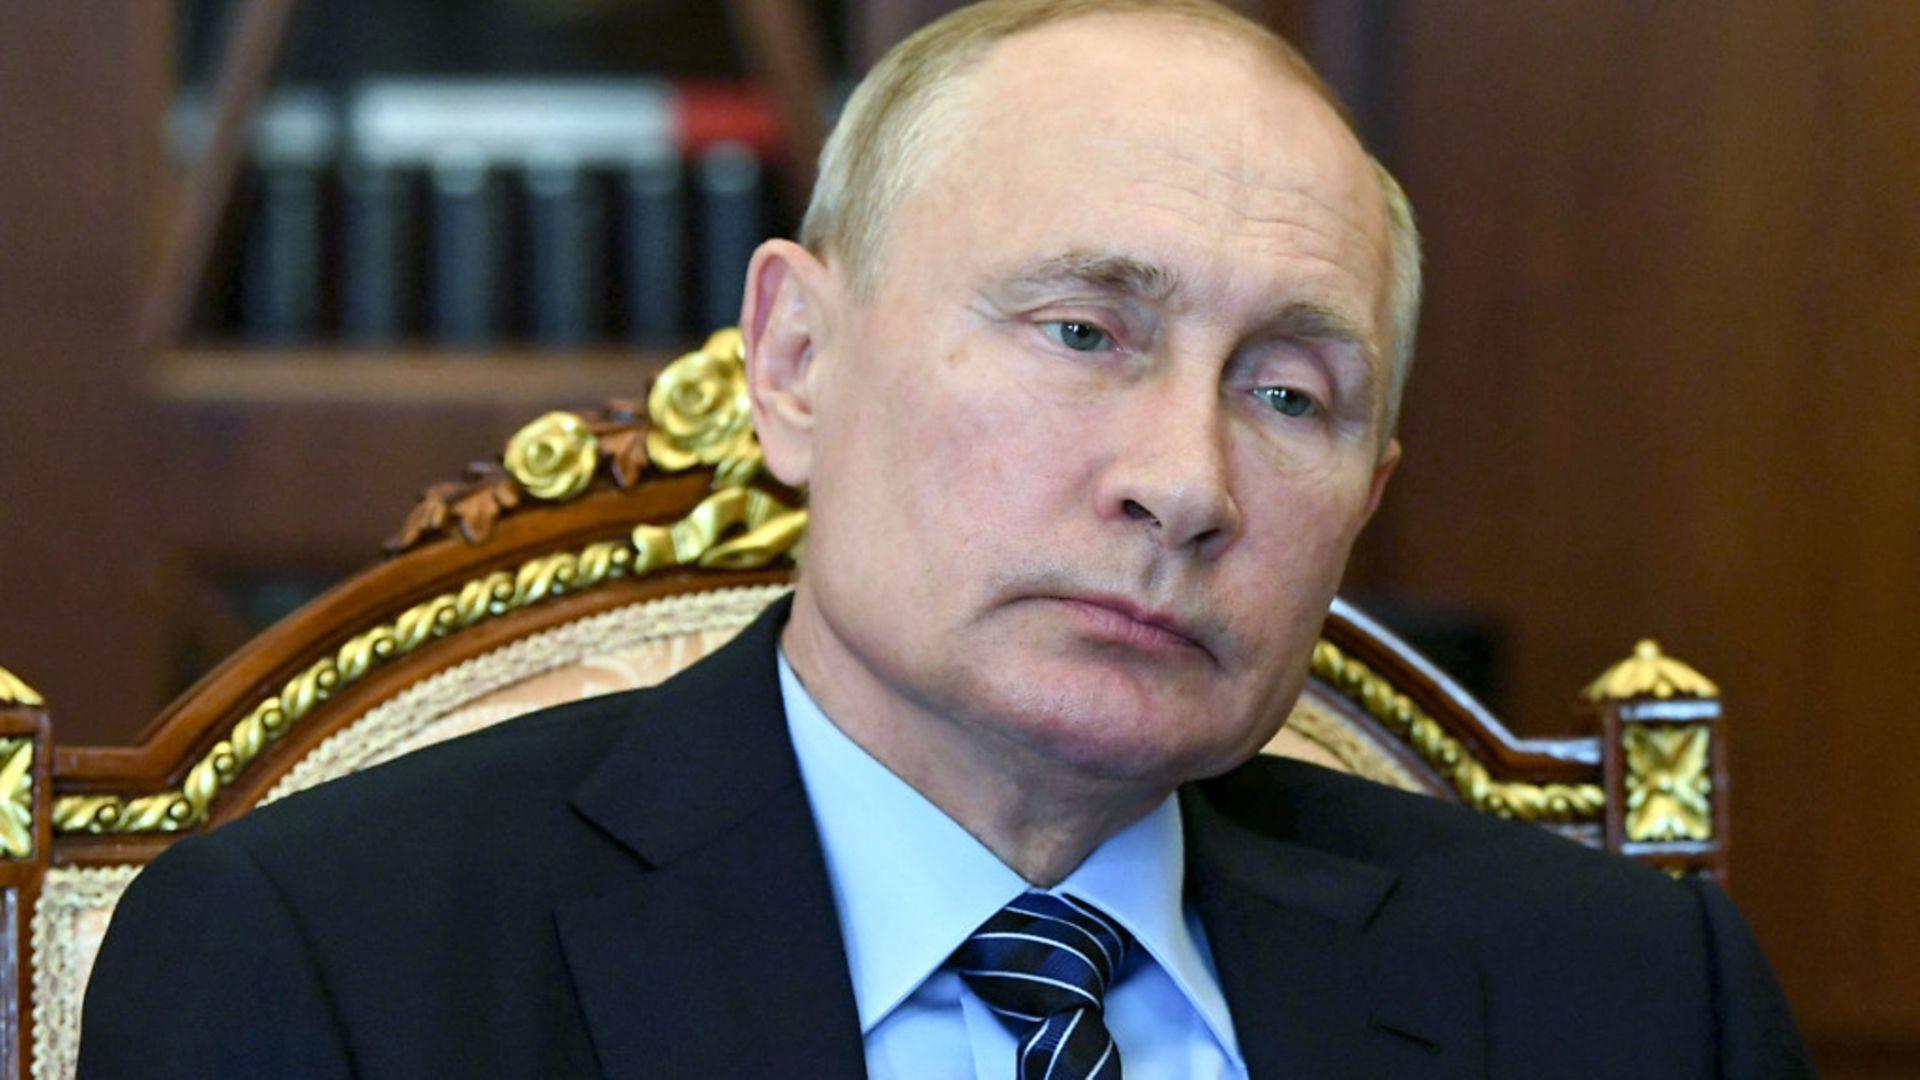 Russian president Vladimir Putin. - Credit: Alexei Nikolsky, Sputnik, Kremlin Pool Photo via AP